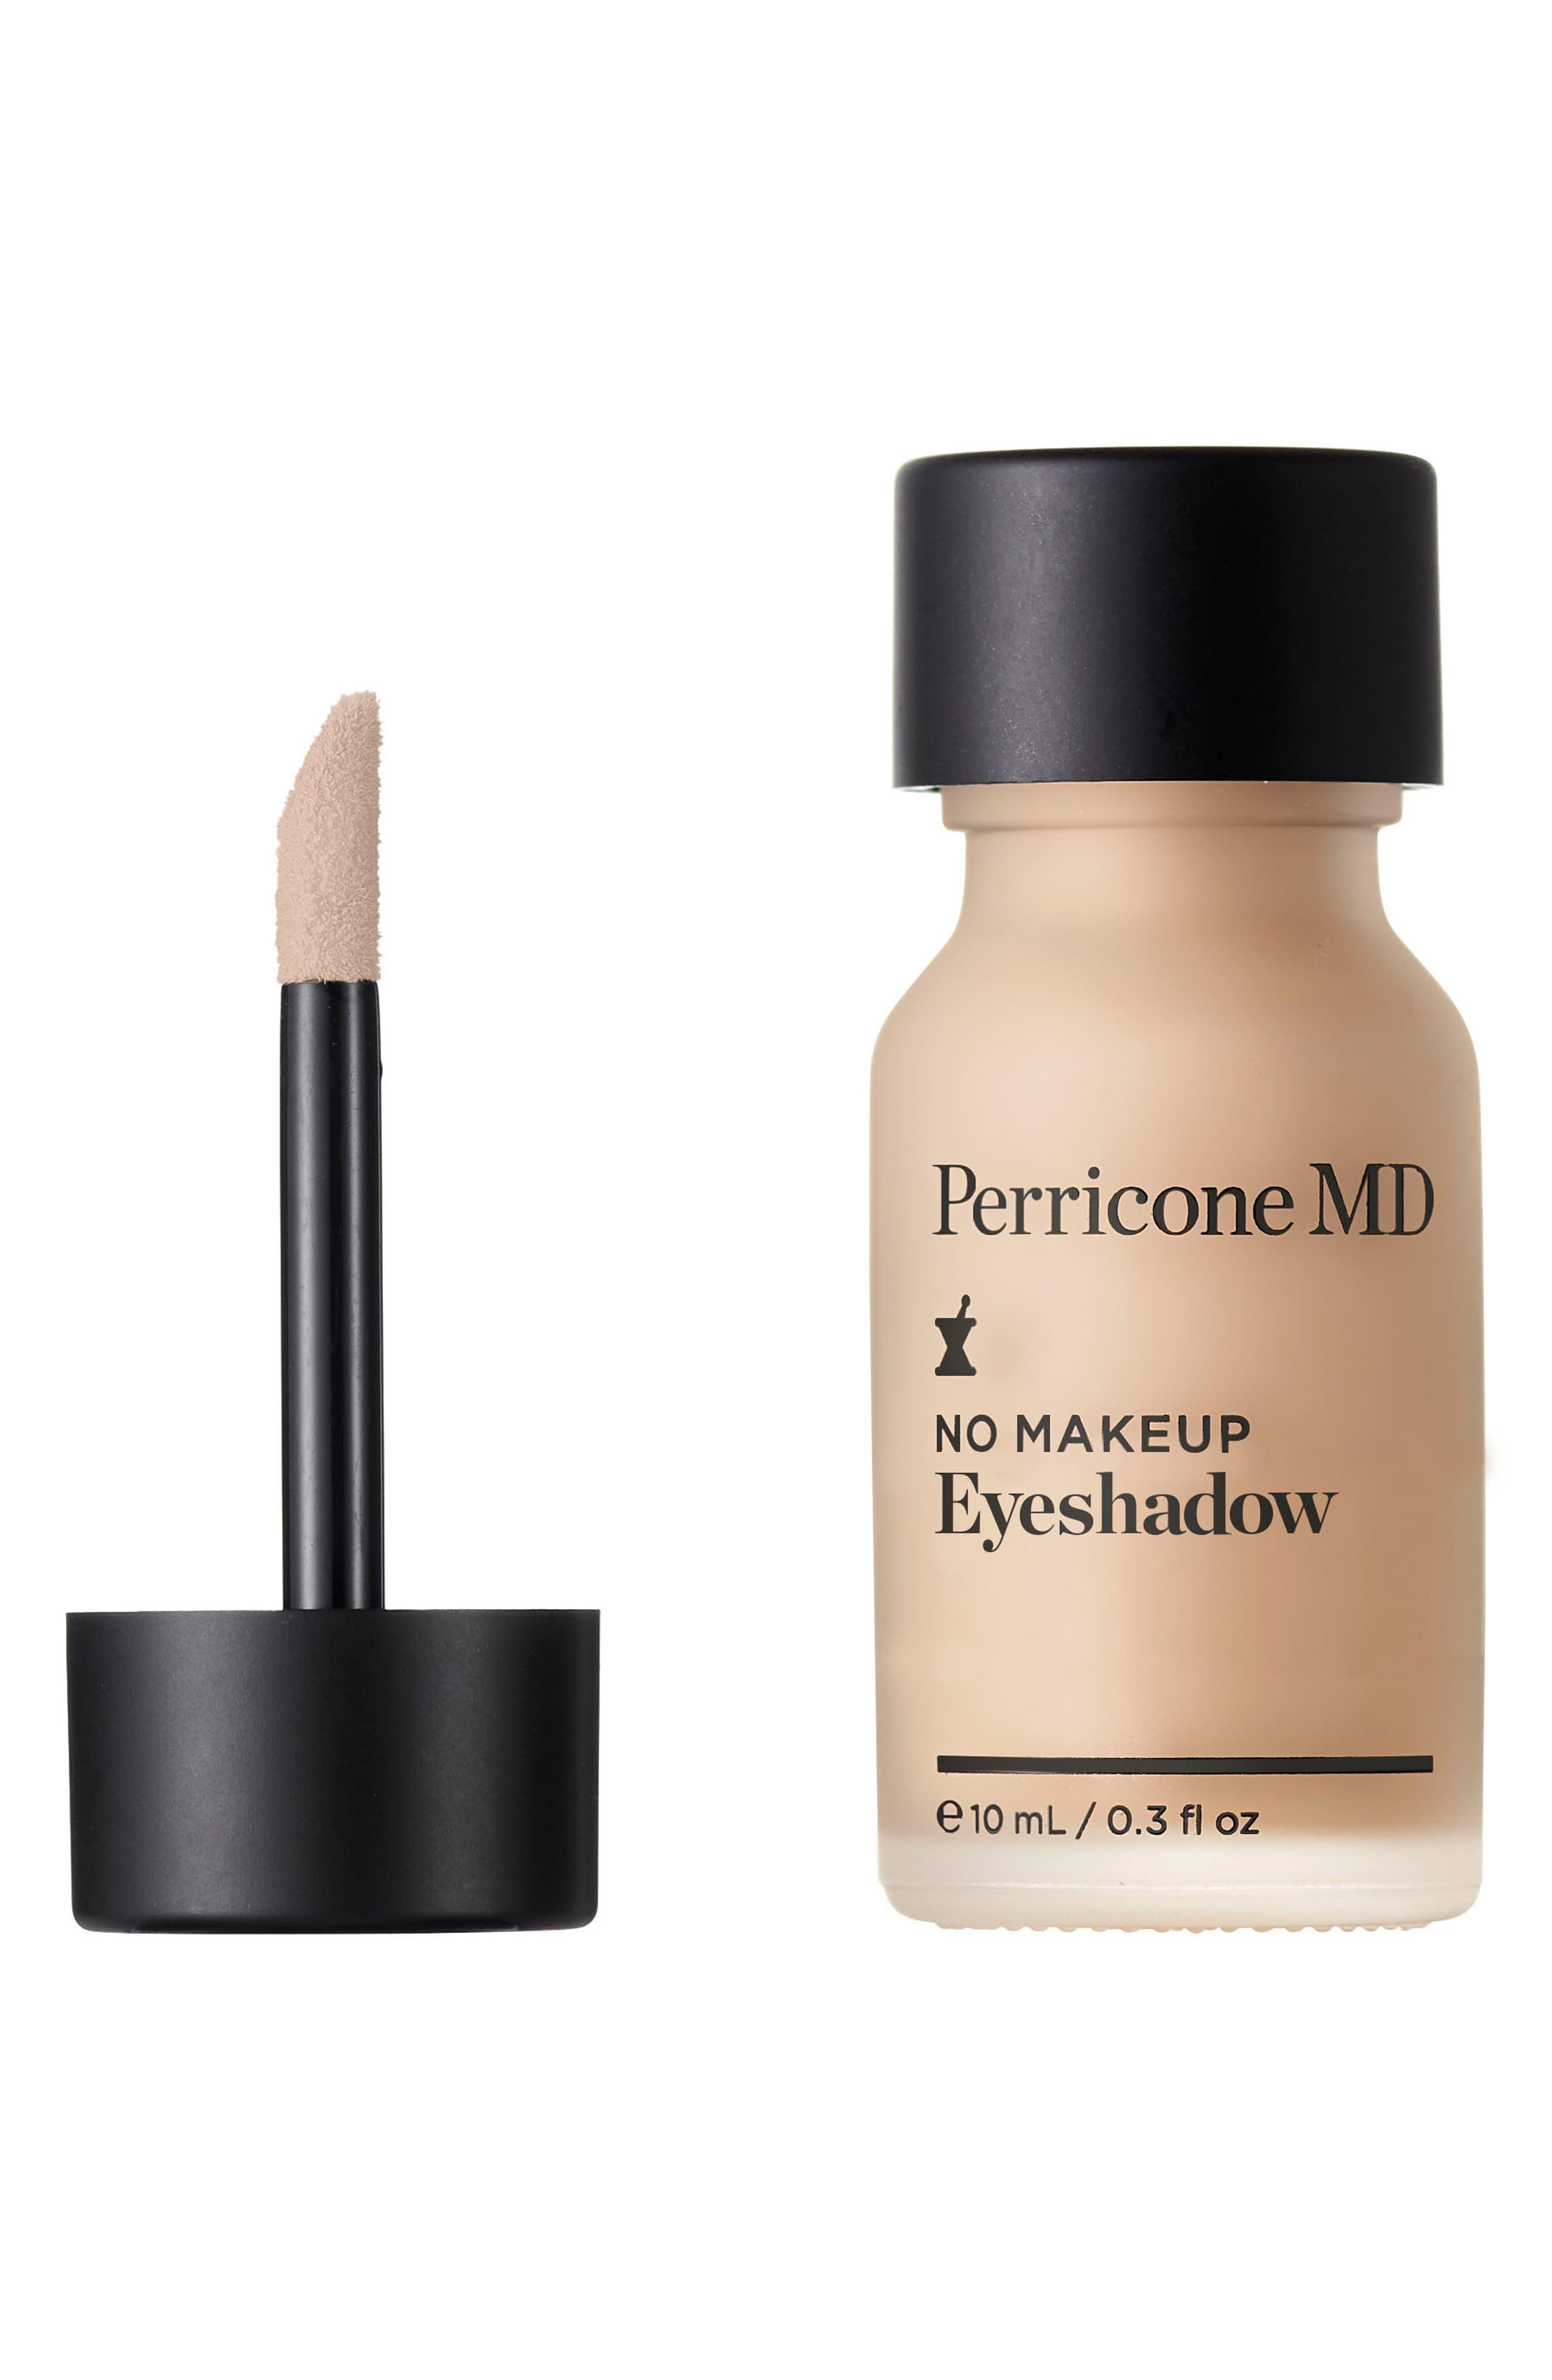 Perricone MD No Makeup Eyeshadow in 2020 Makeup